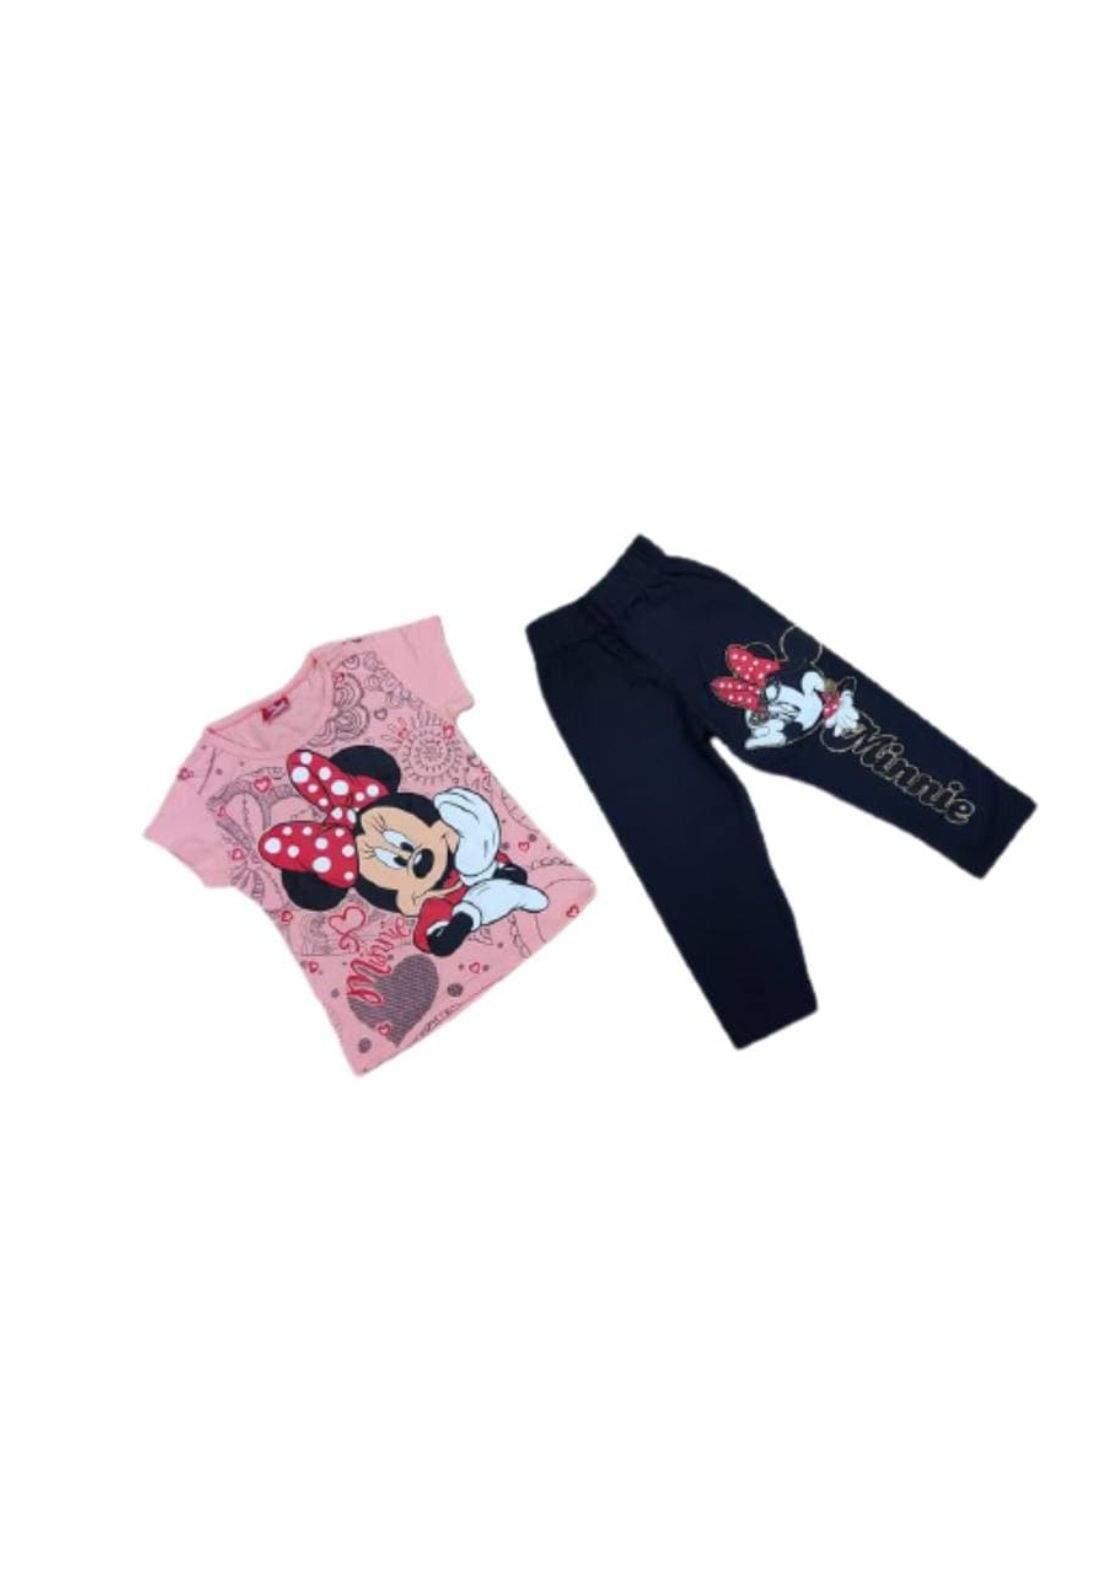 Tracksuit for girls pink  (t-shirt+pijamas) تراكسوت بناتي وردي (بجامة+تيشيرت)